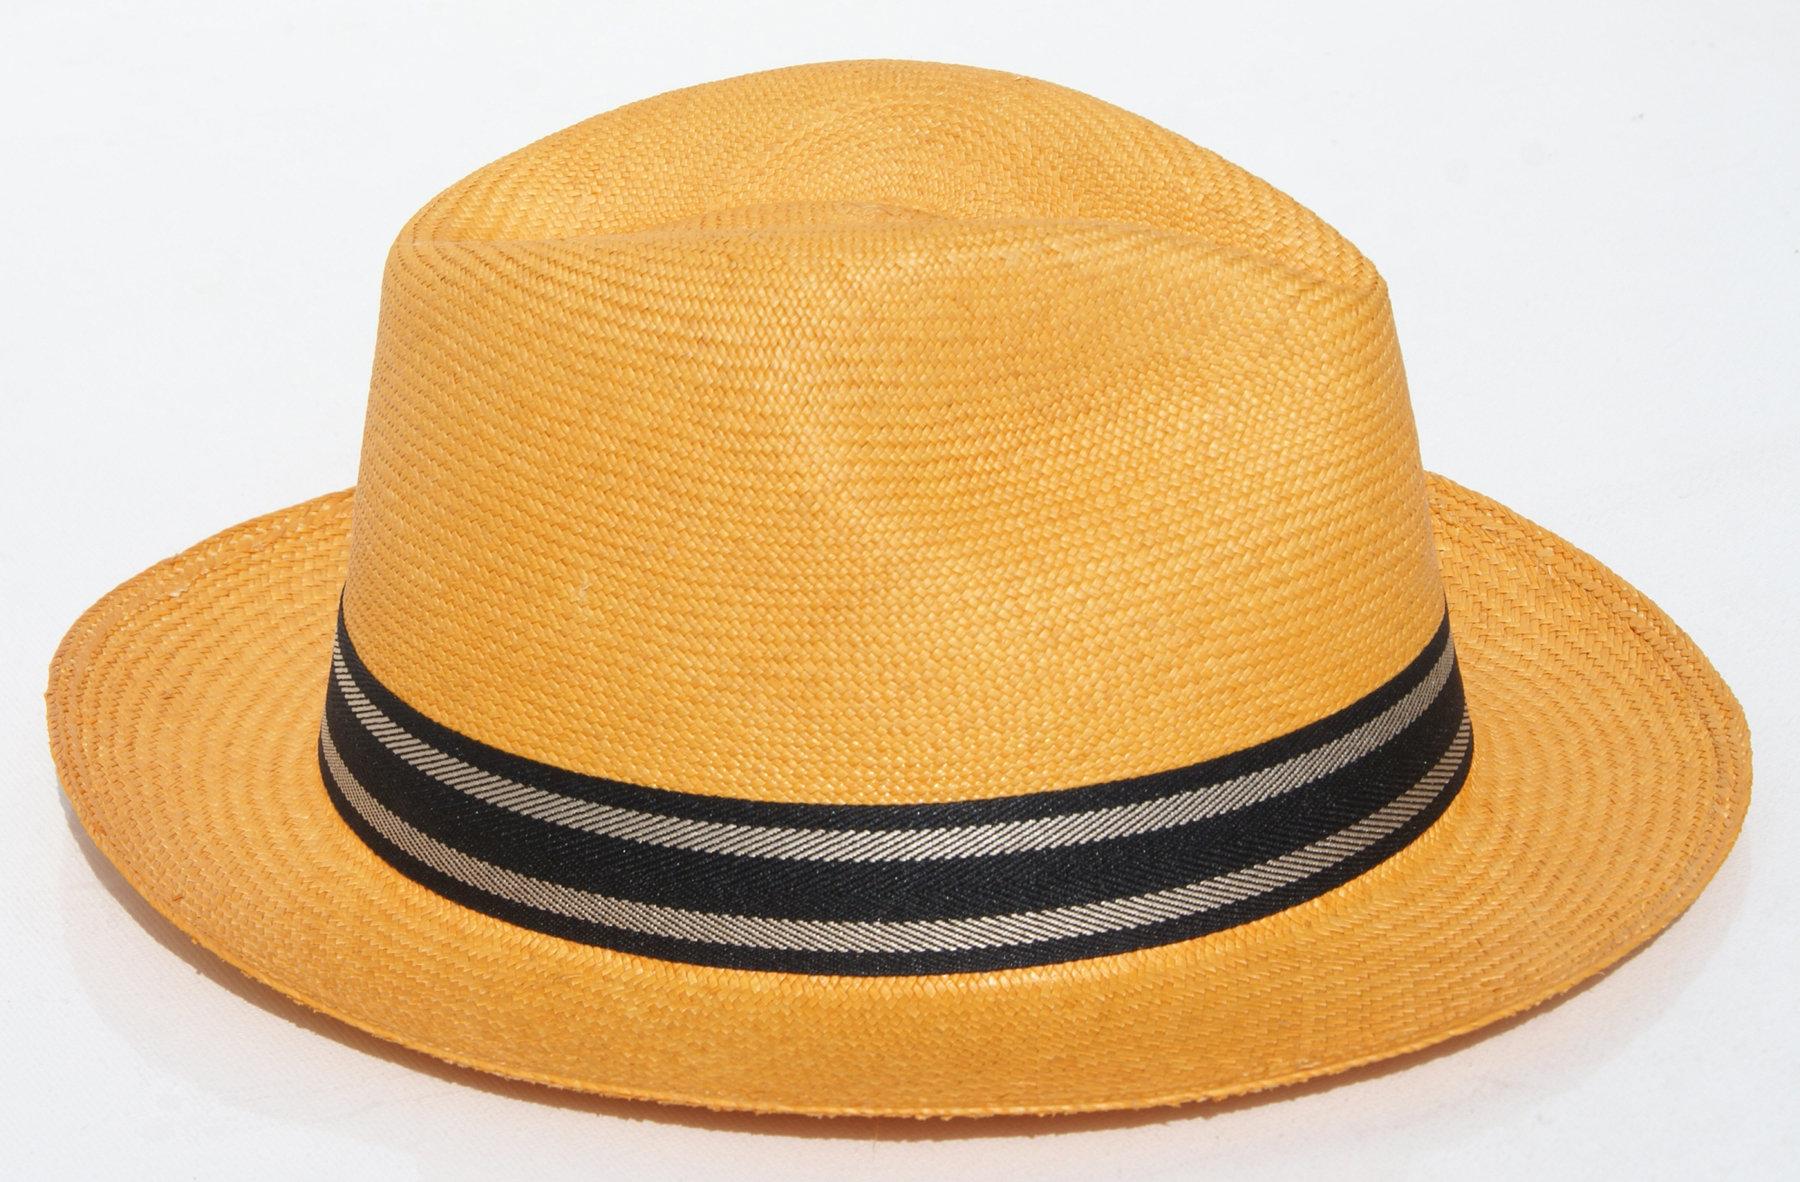 Sombreros de paja toquilla de color naranja 60bce17ce76